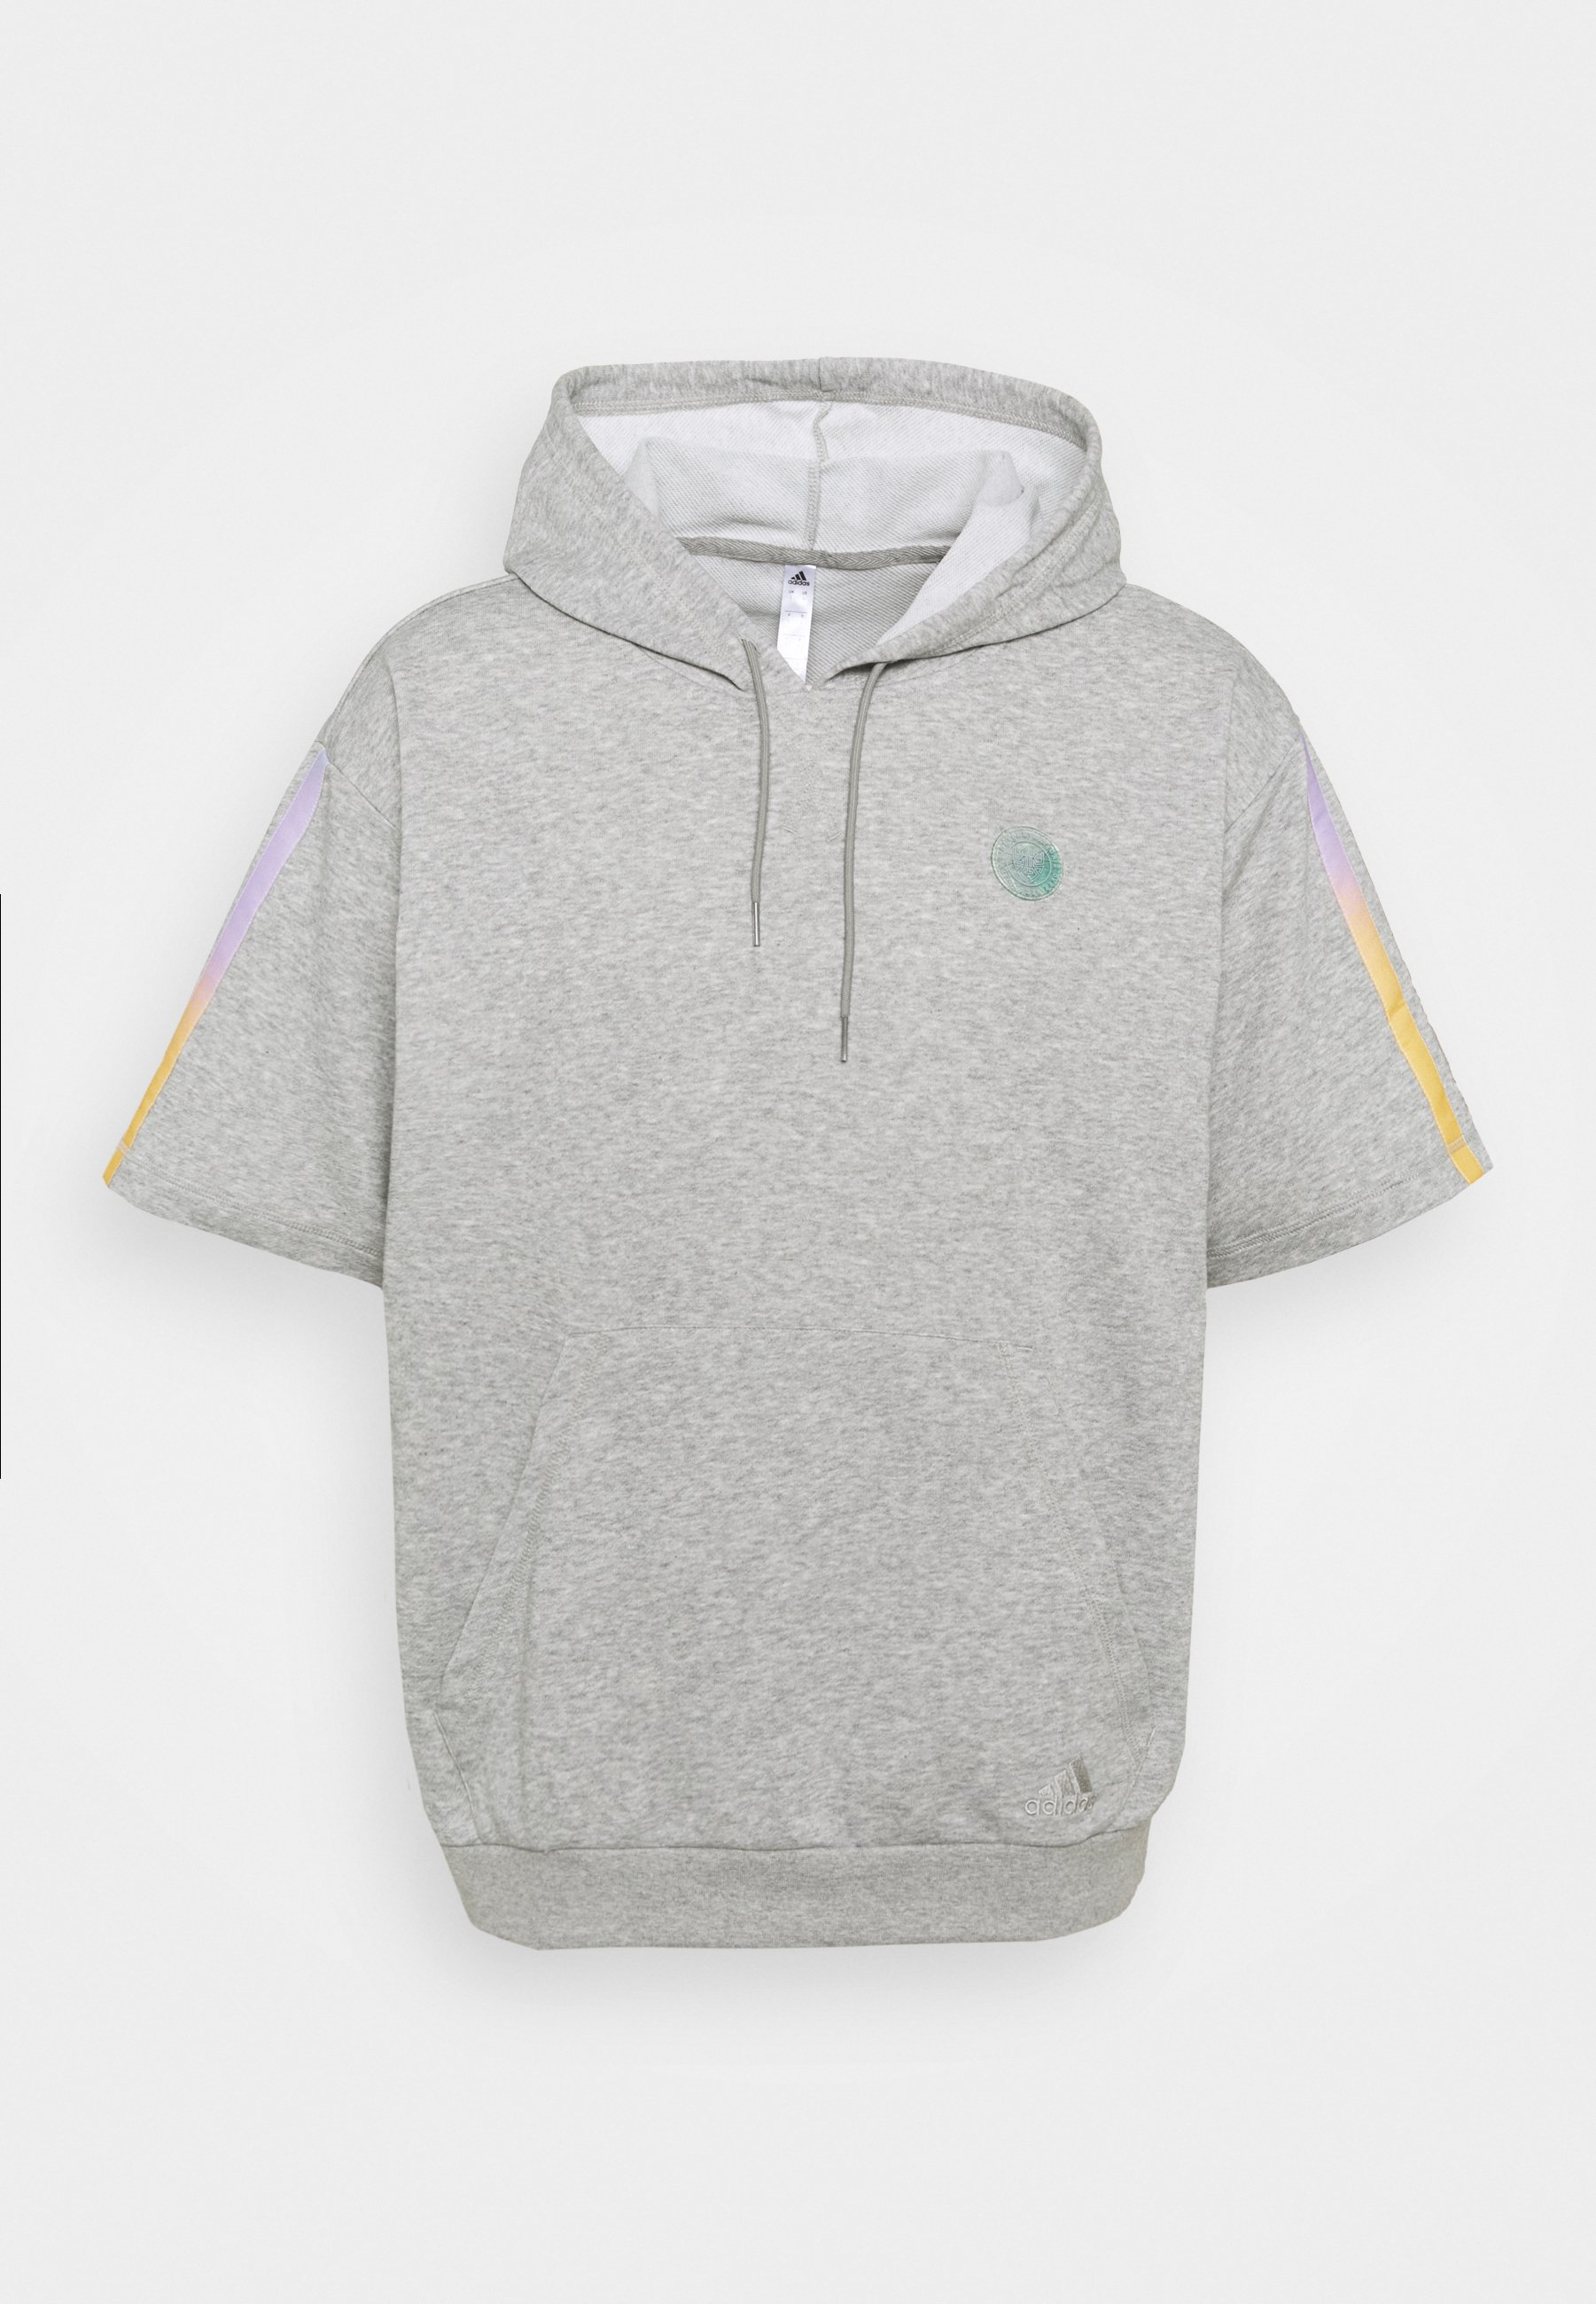 Homme DONOVAN MITCHELL BASKETBALL HOODIE - Sweatshirt